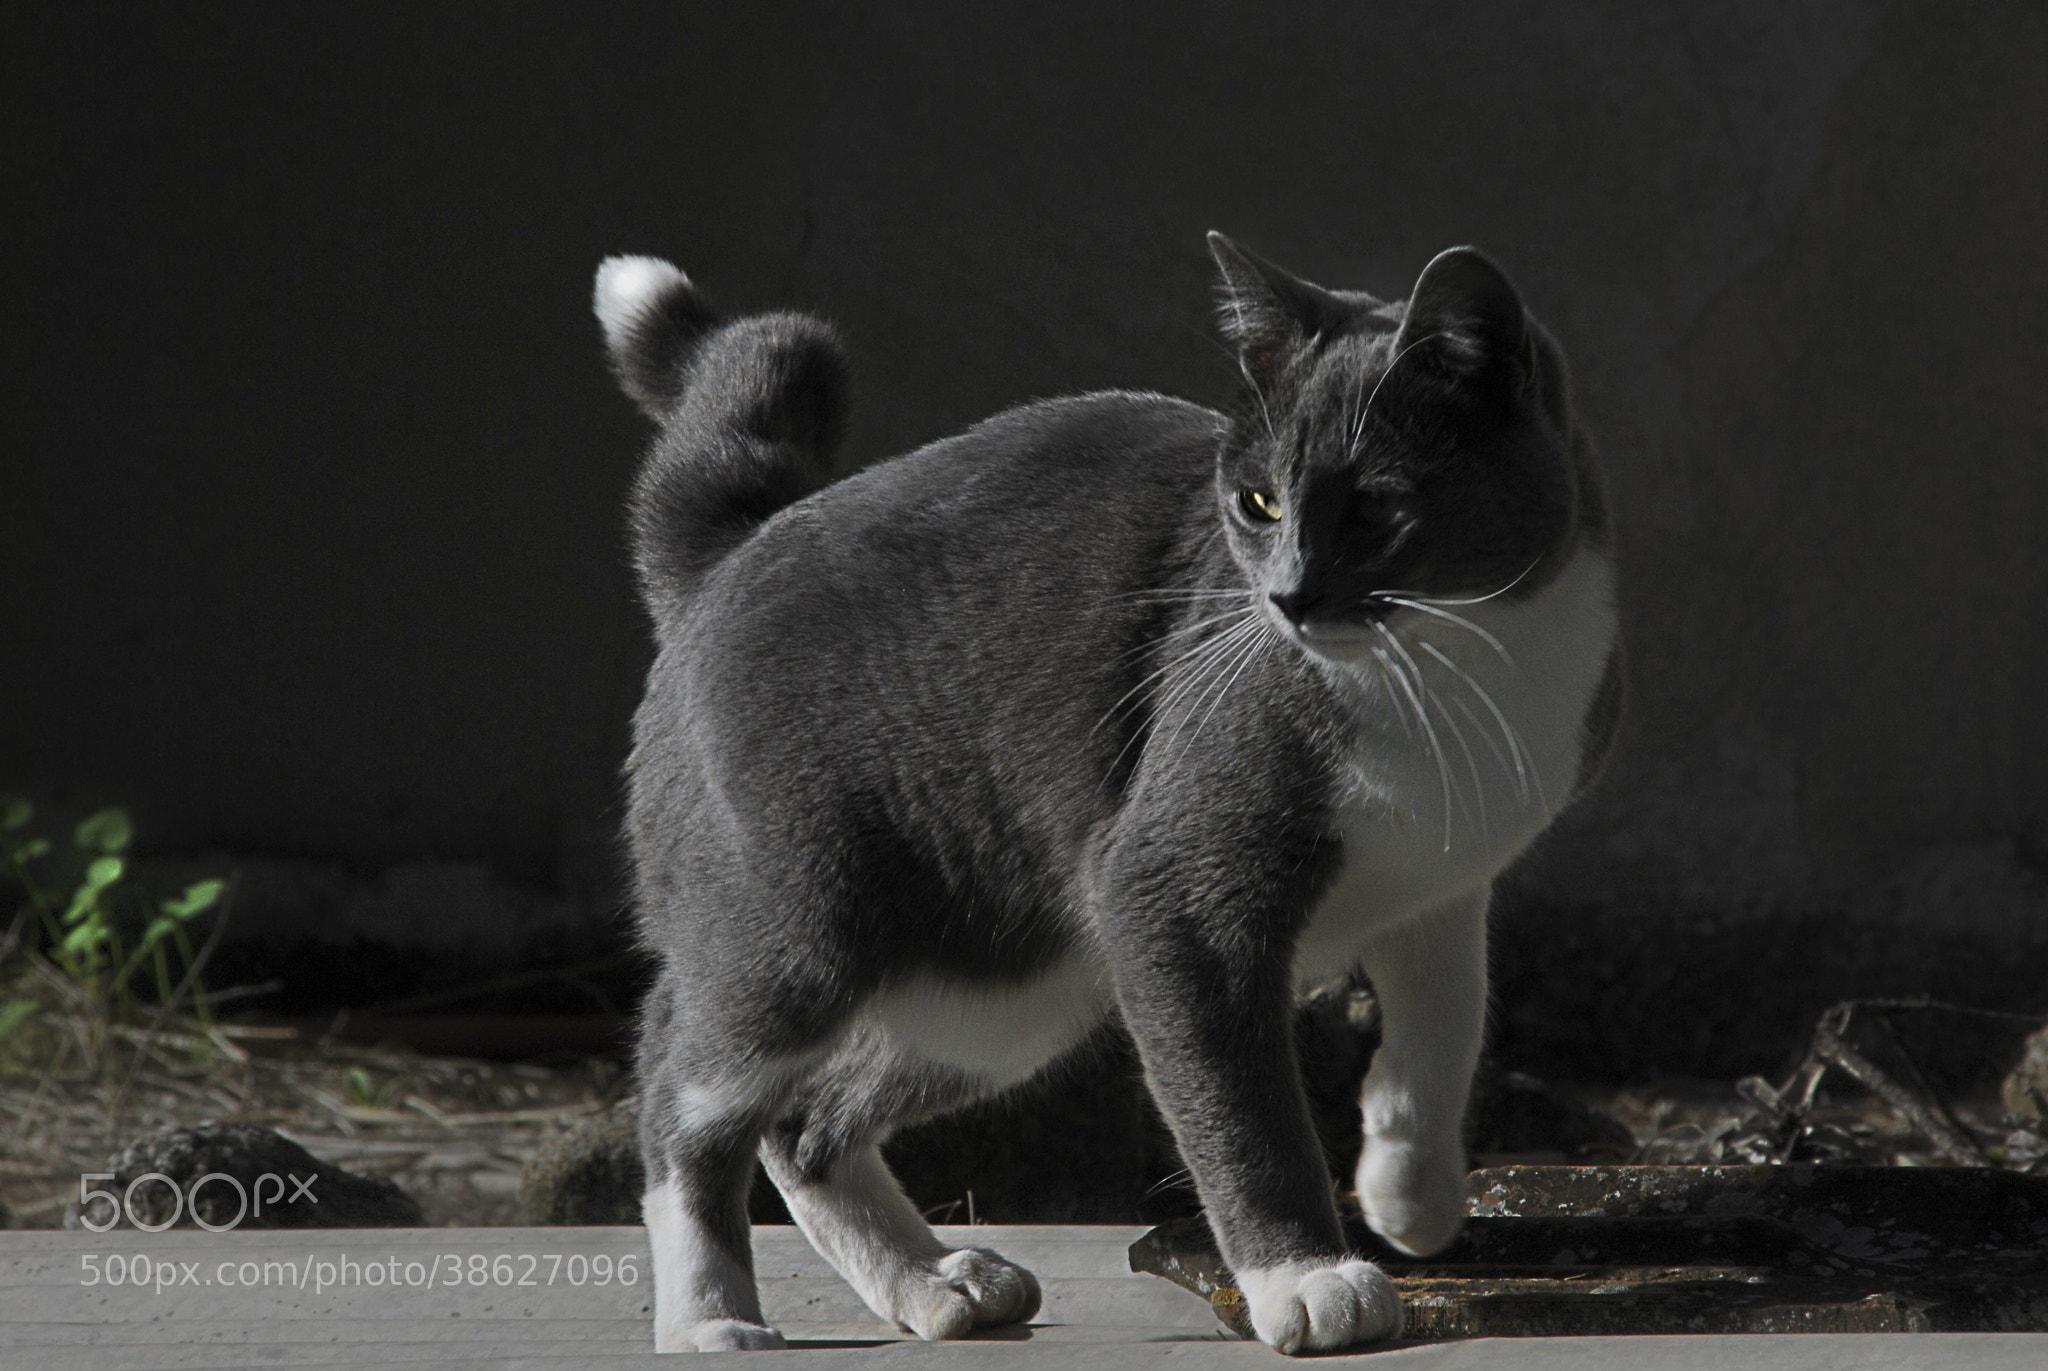 Photograph Cat by Fabio La Monica on 500px